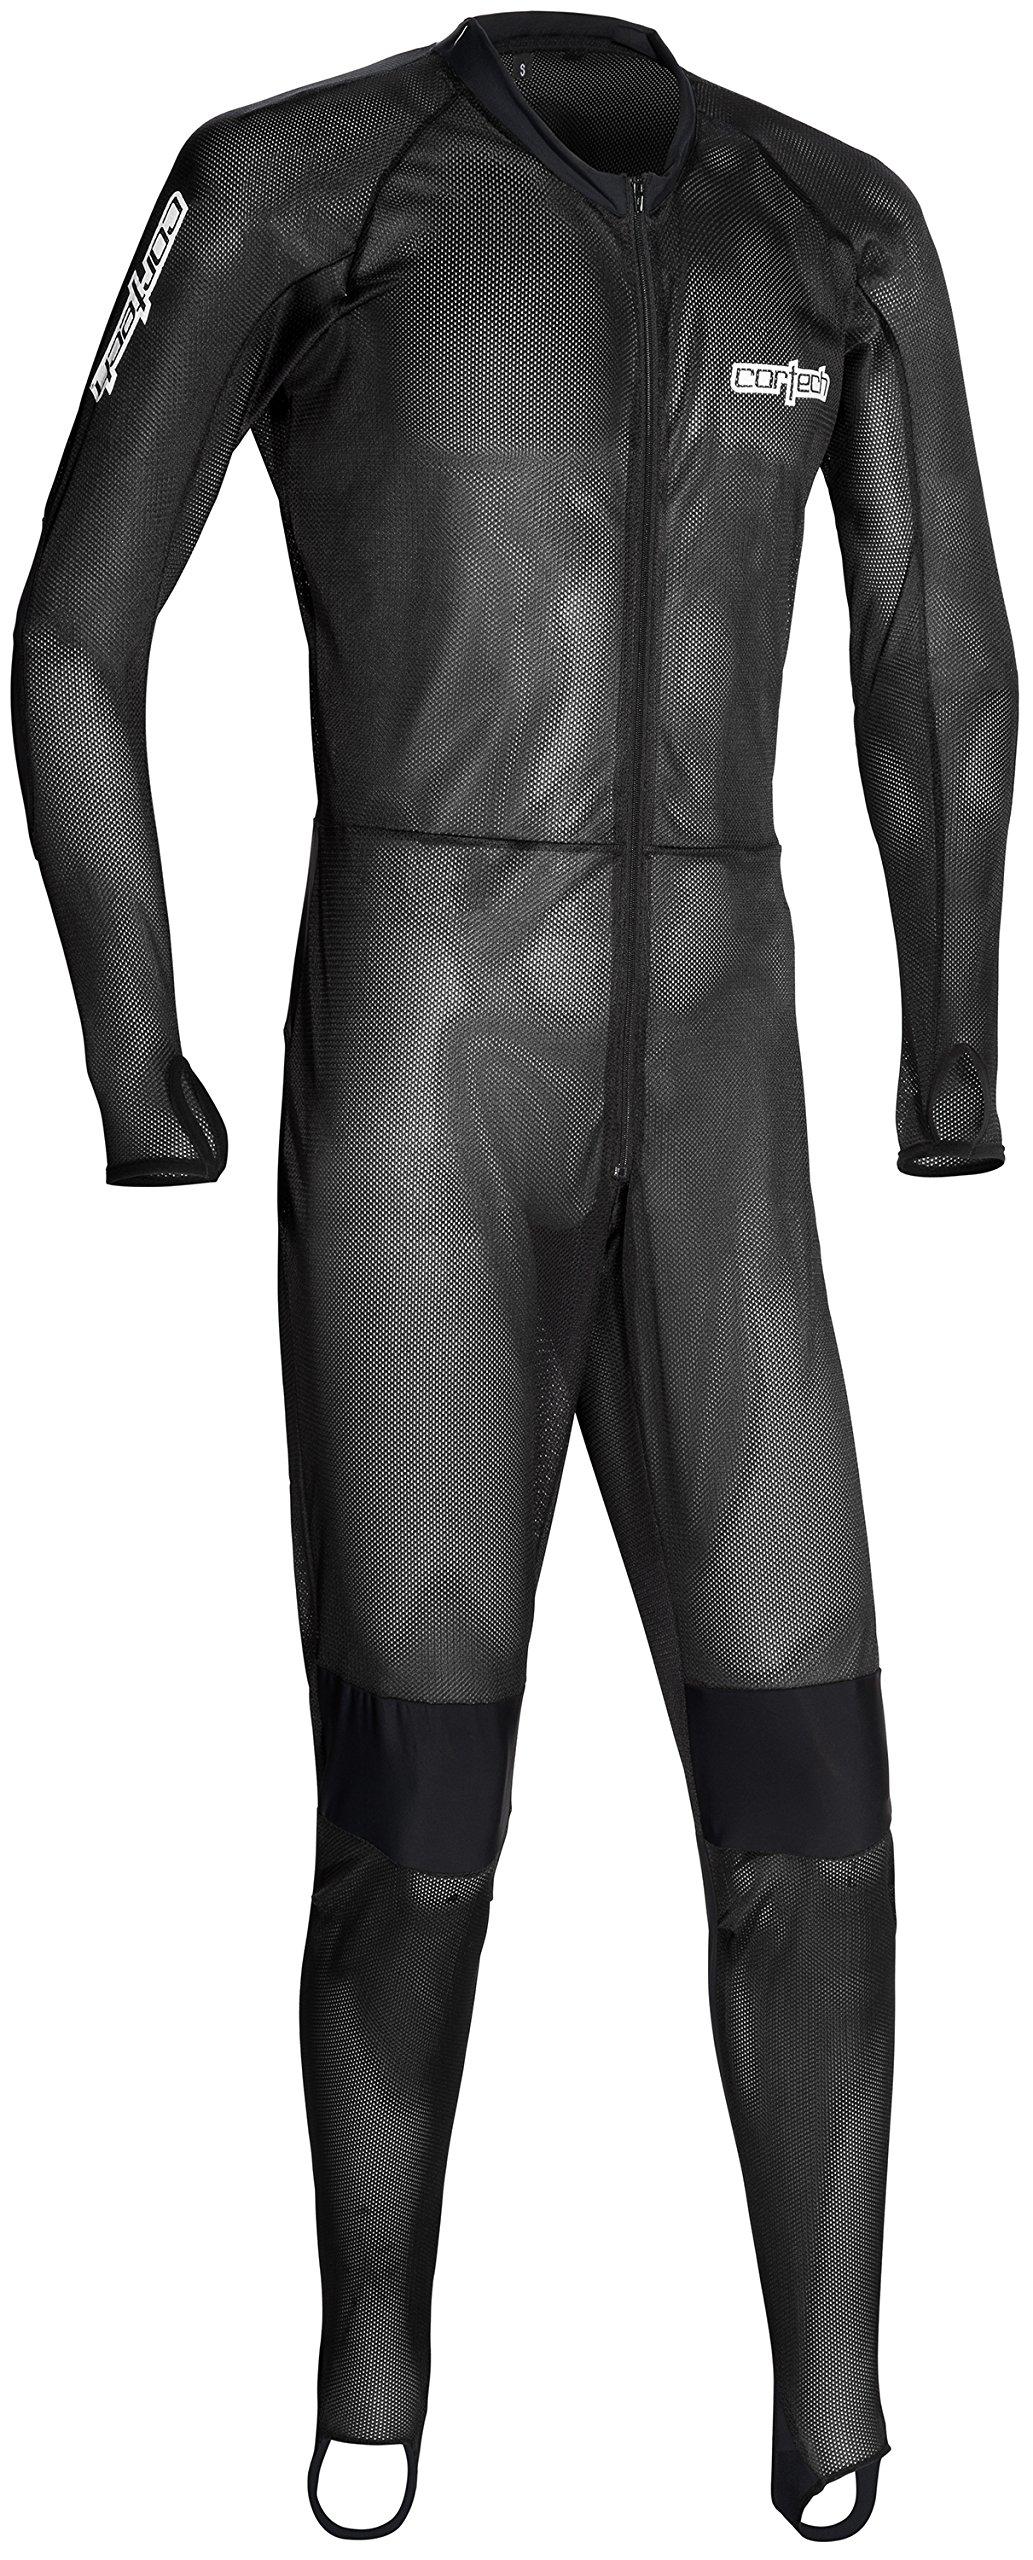 Cortech XF-10-8975-0105-03 Quick Dry Air Undersuit, Distinct Name: Black, Gender: Mens/Unisex, Primary Color: Black, Size: XS by Cortech